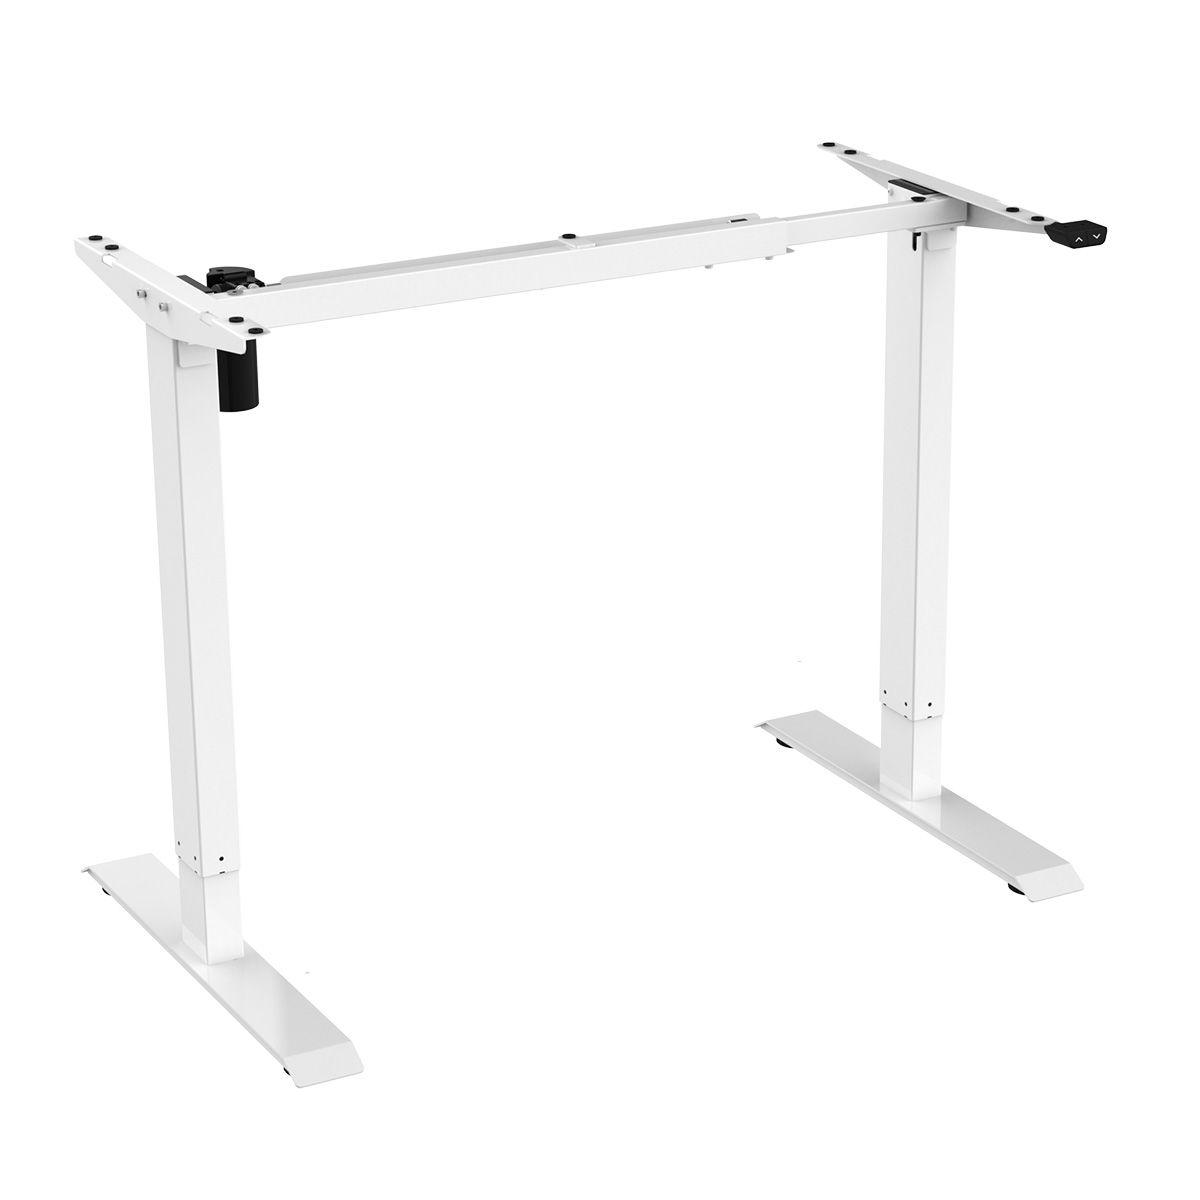 Floor Standing FS-DR48Mii Shallow Electric Height Adjustable Desk Frame (White)